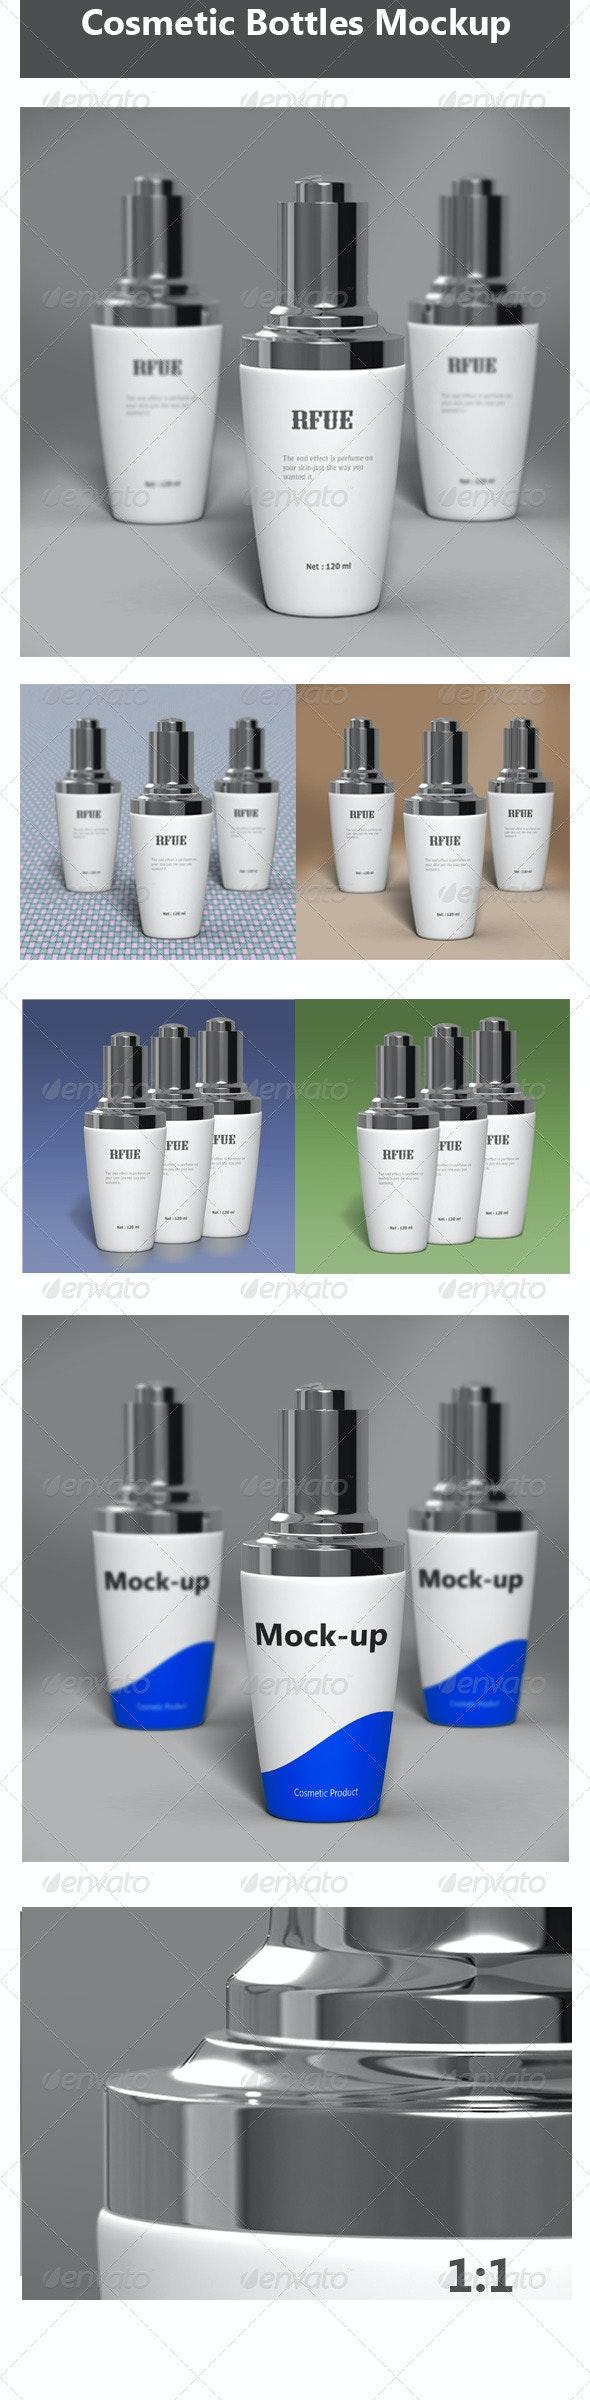 Cosmetic Bottles Mock-up - Beauty Packaging